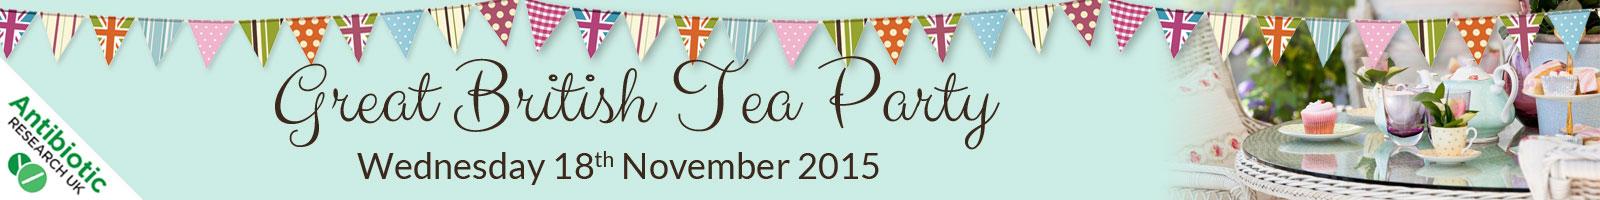 Antibiotic Research UK Great British Tea Party 2015